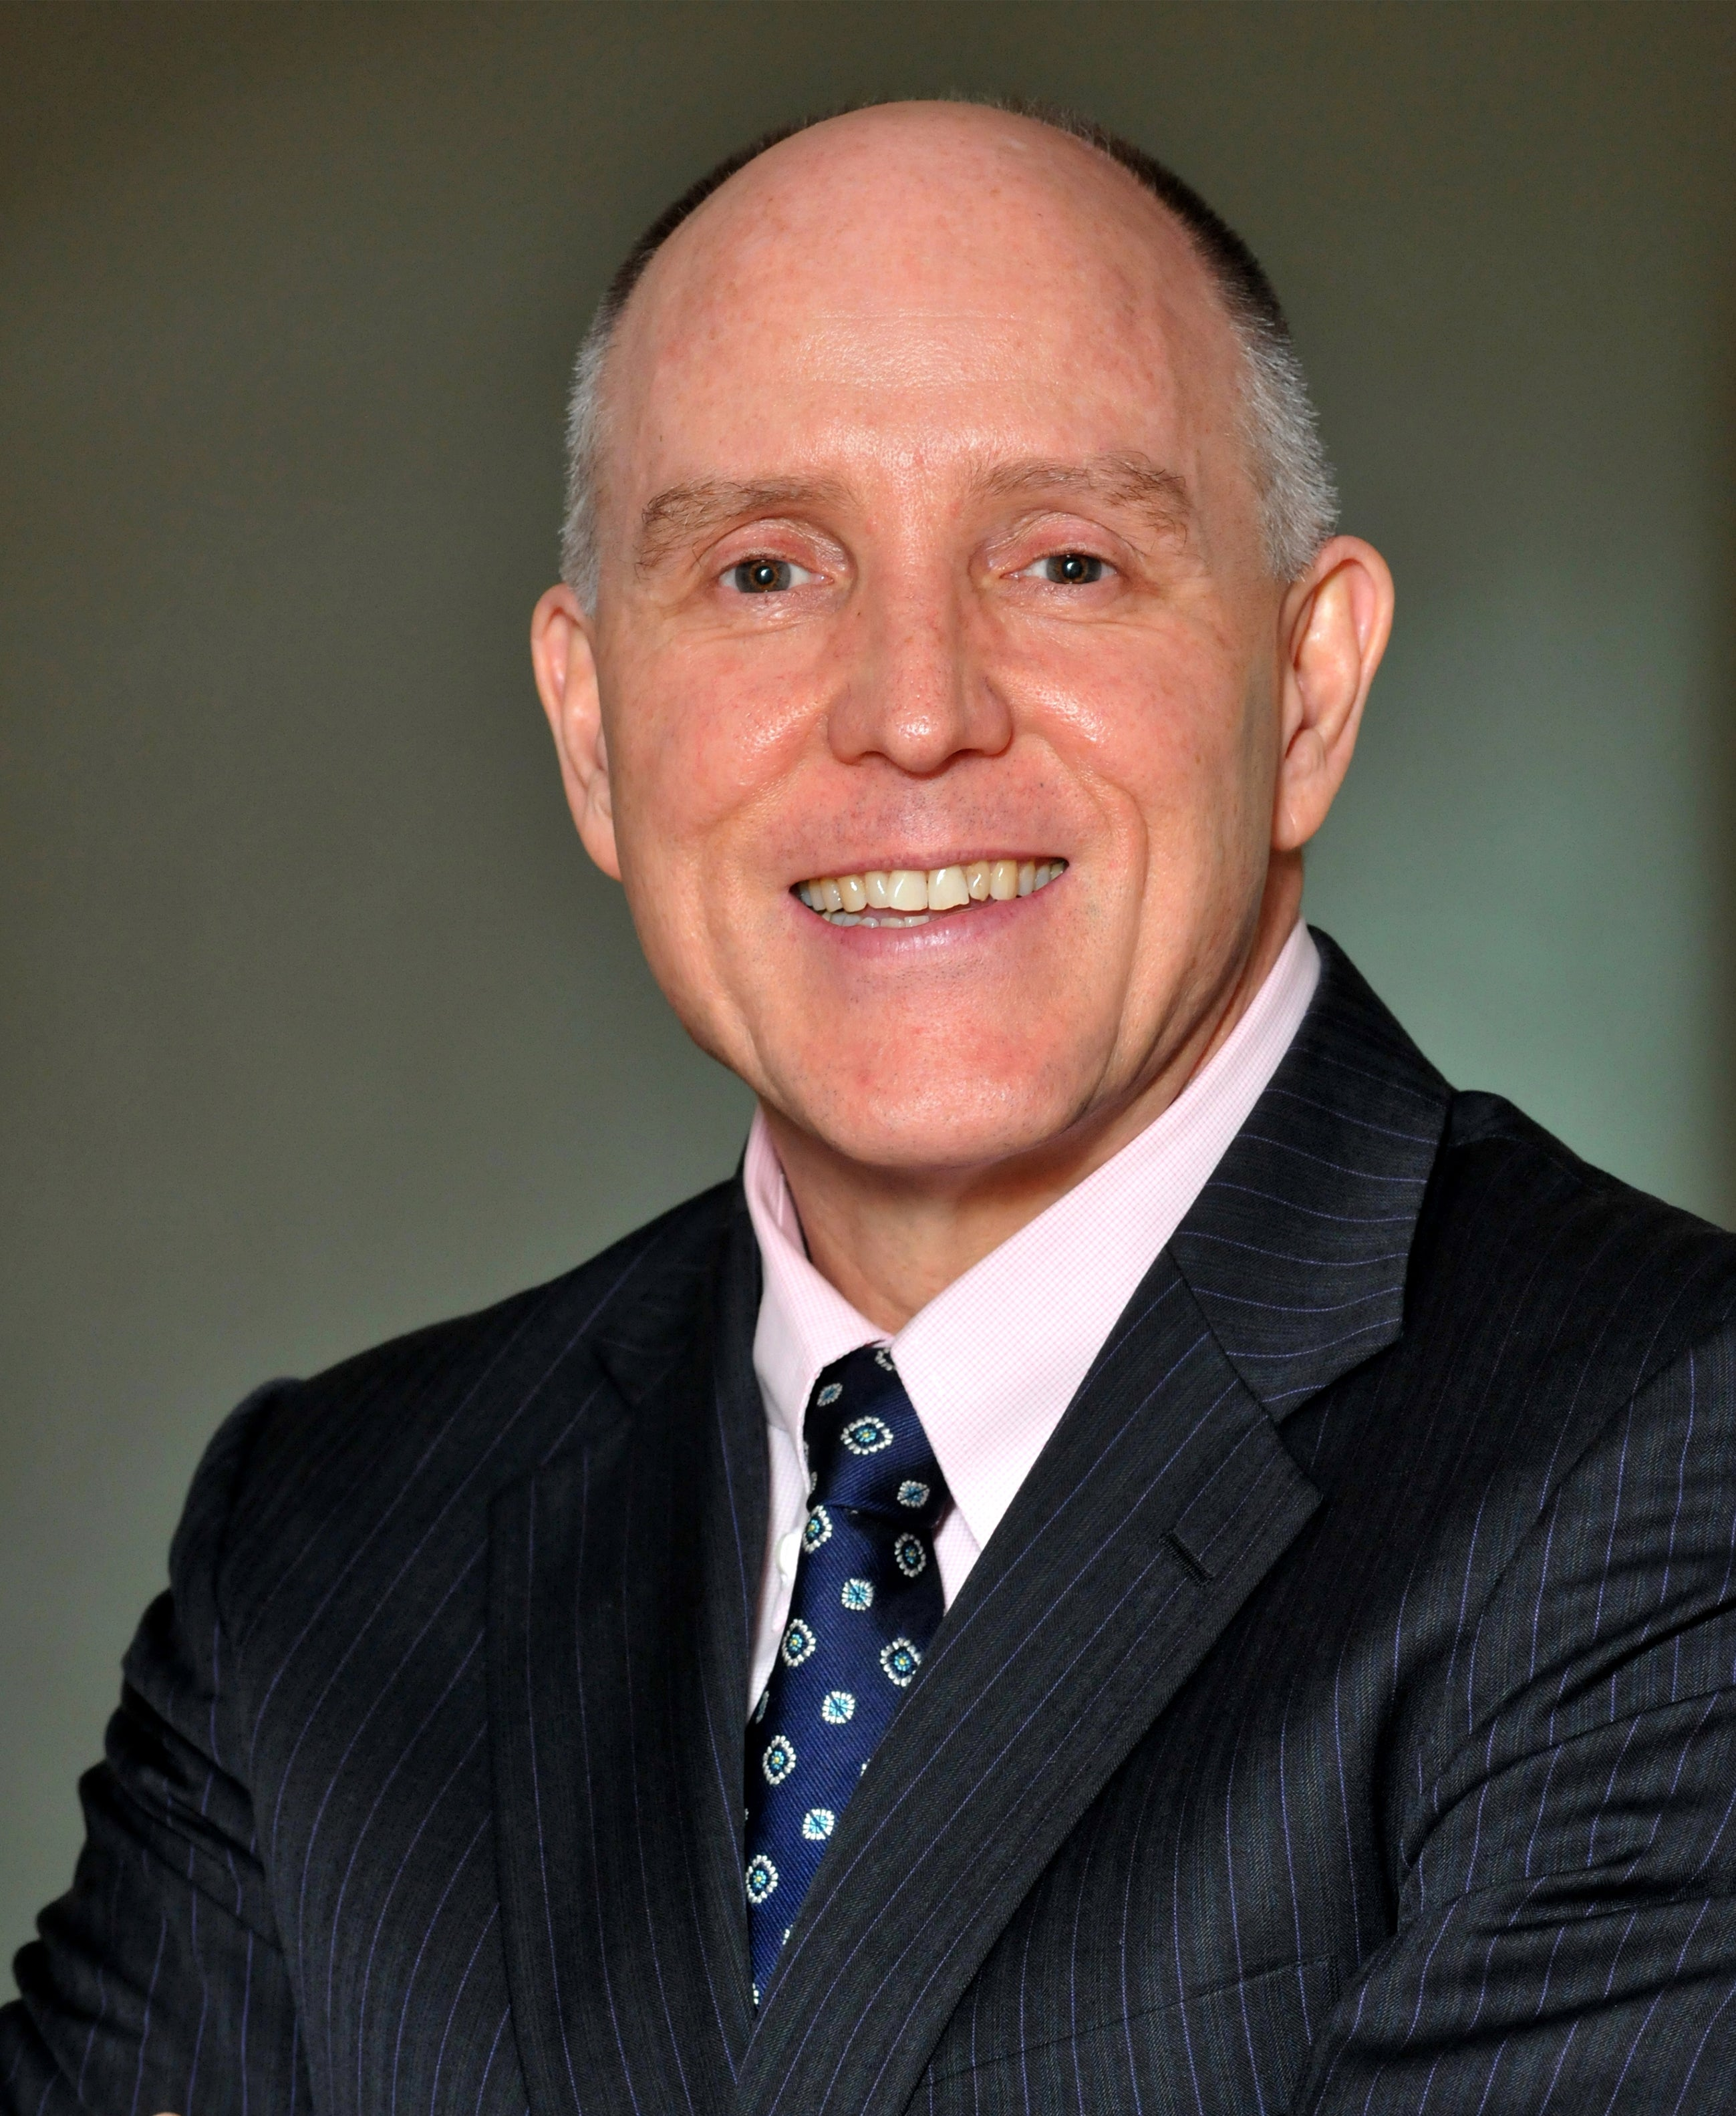 Headshot of Paul Scanlon